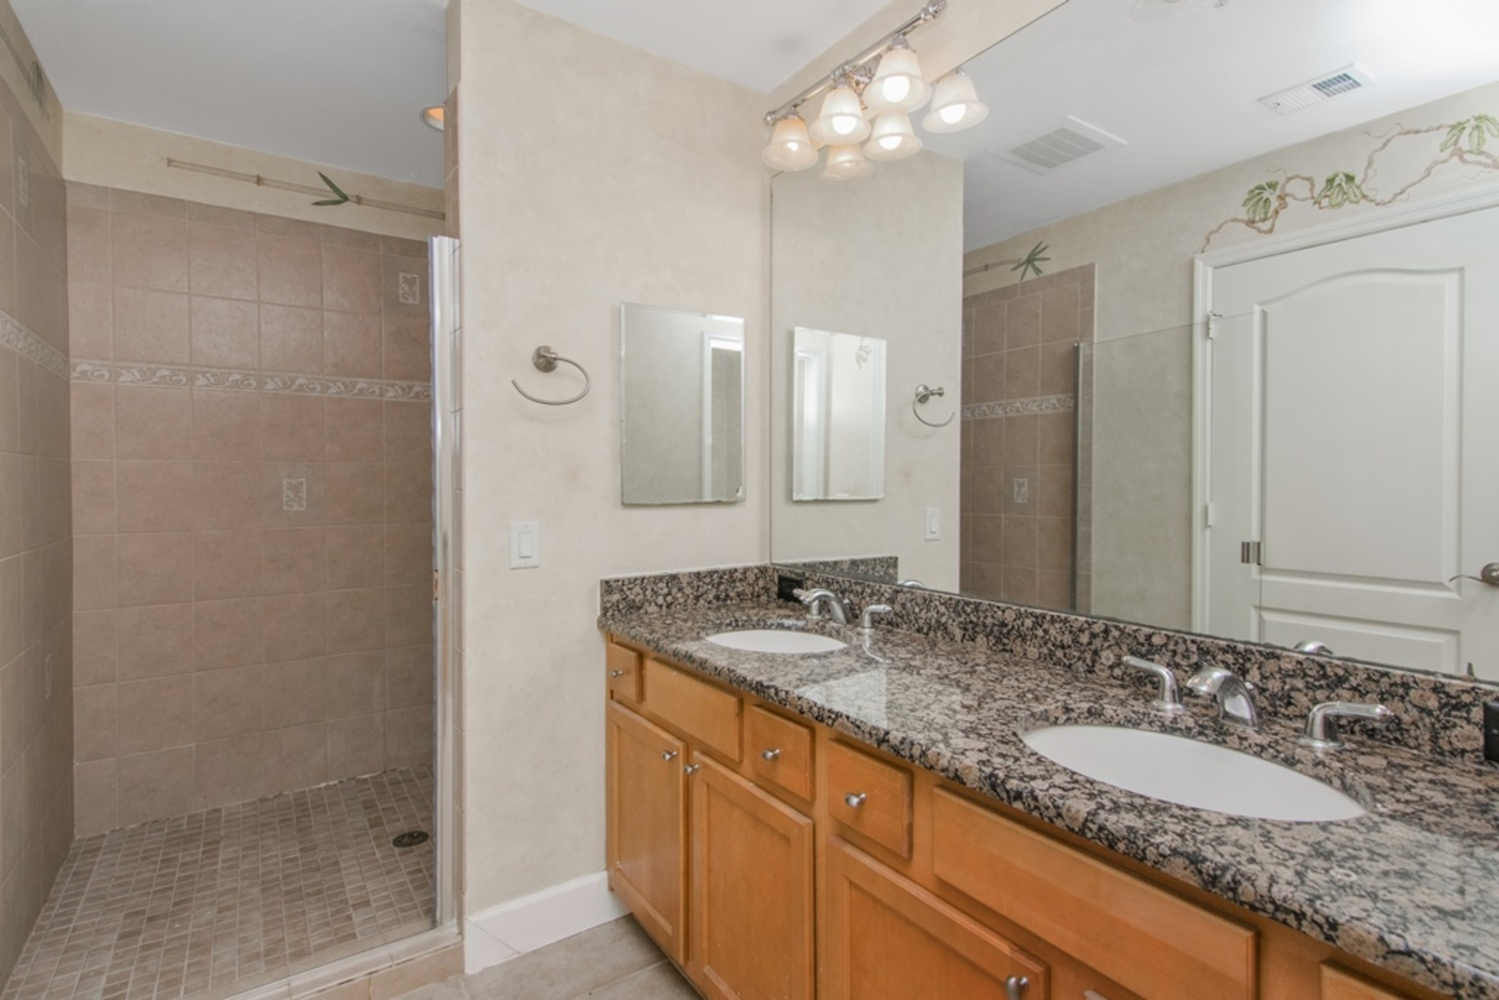 26 master bathroom